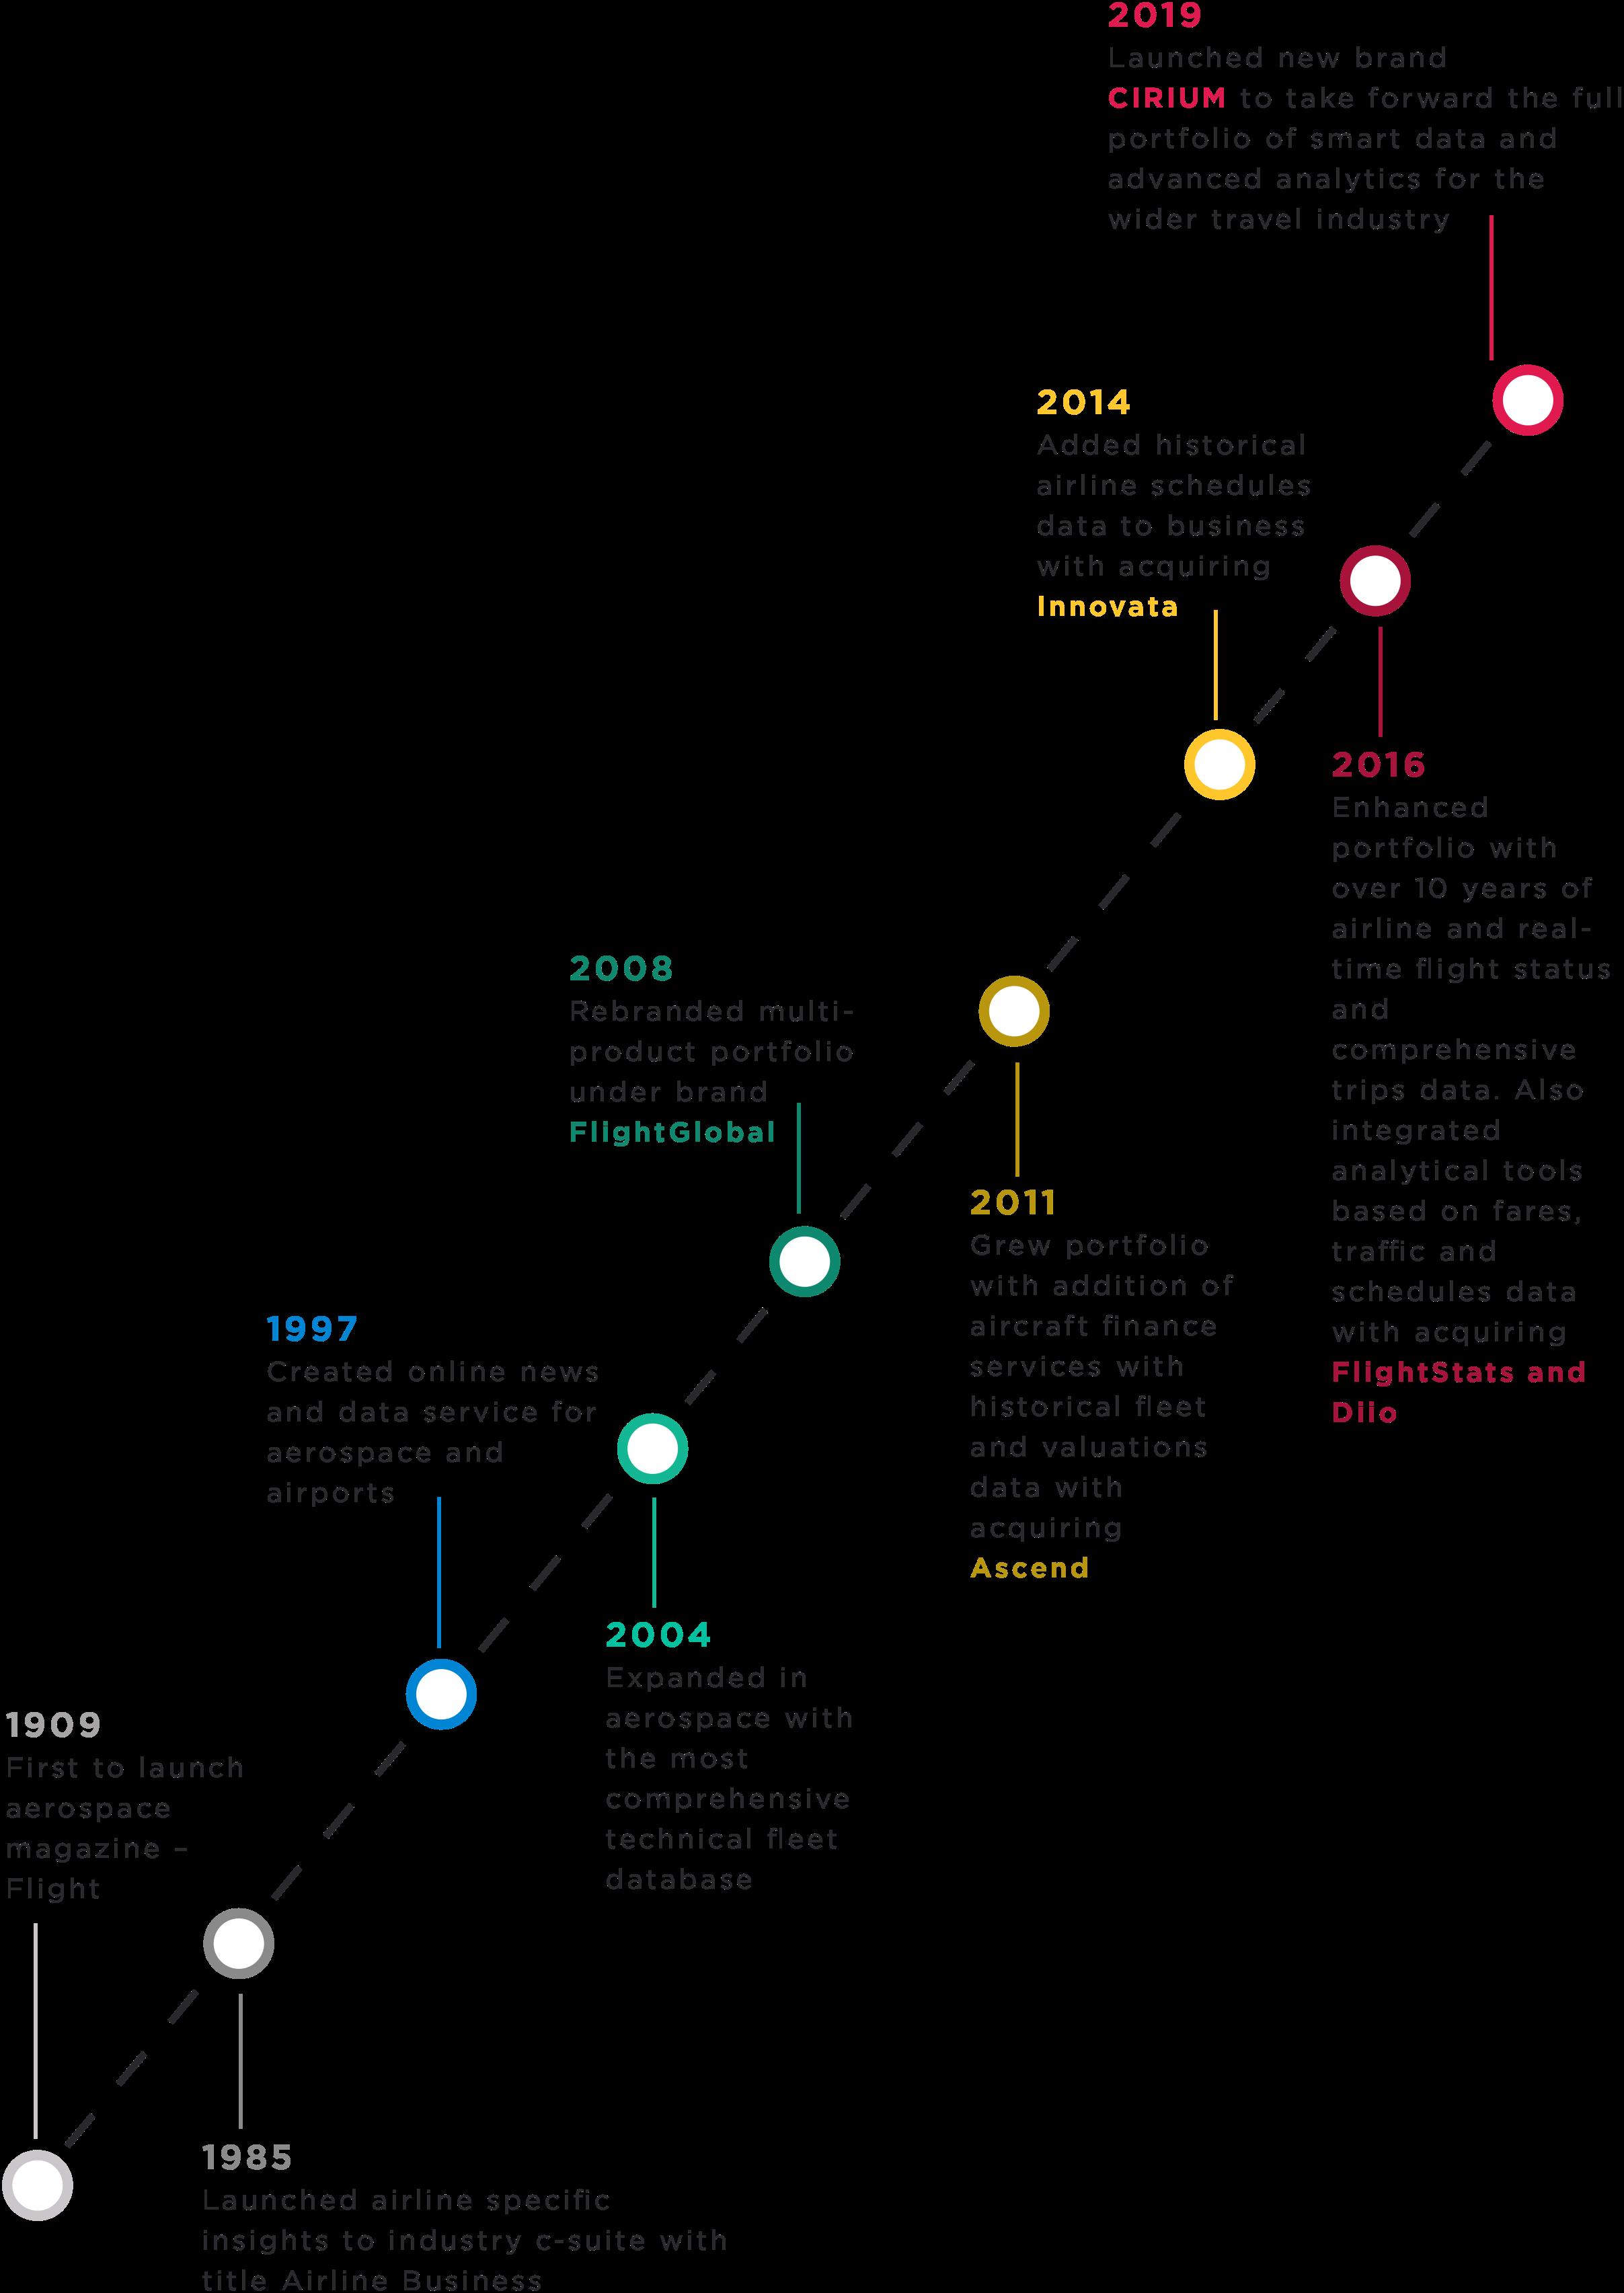 Cirium - Company Timeline